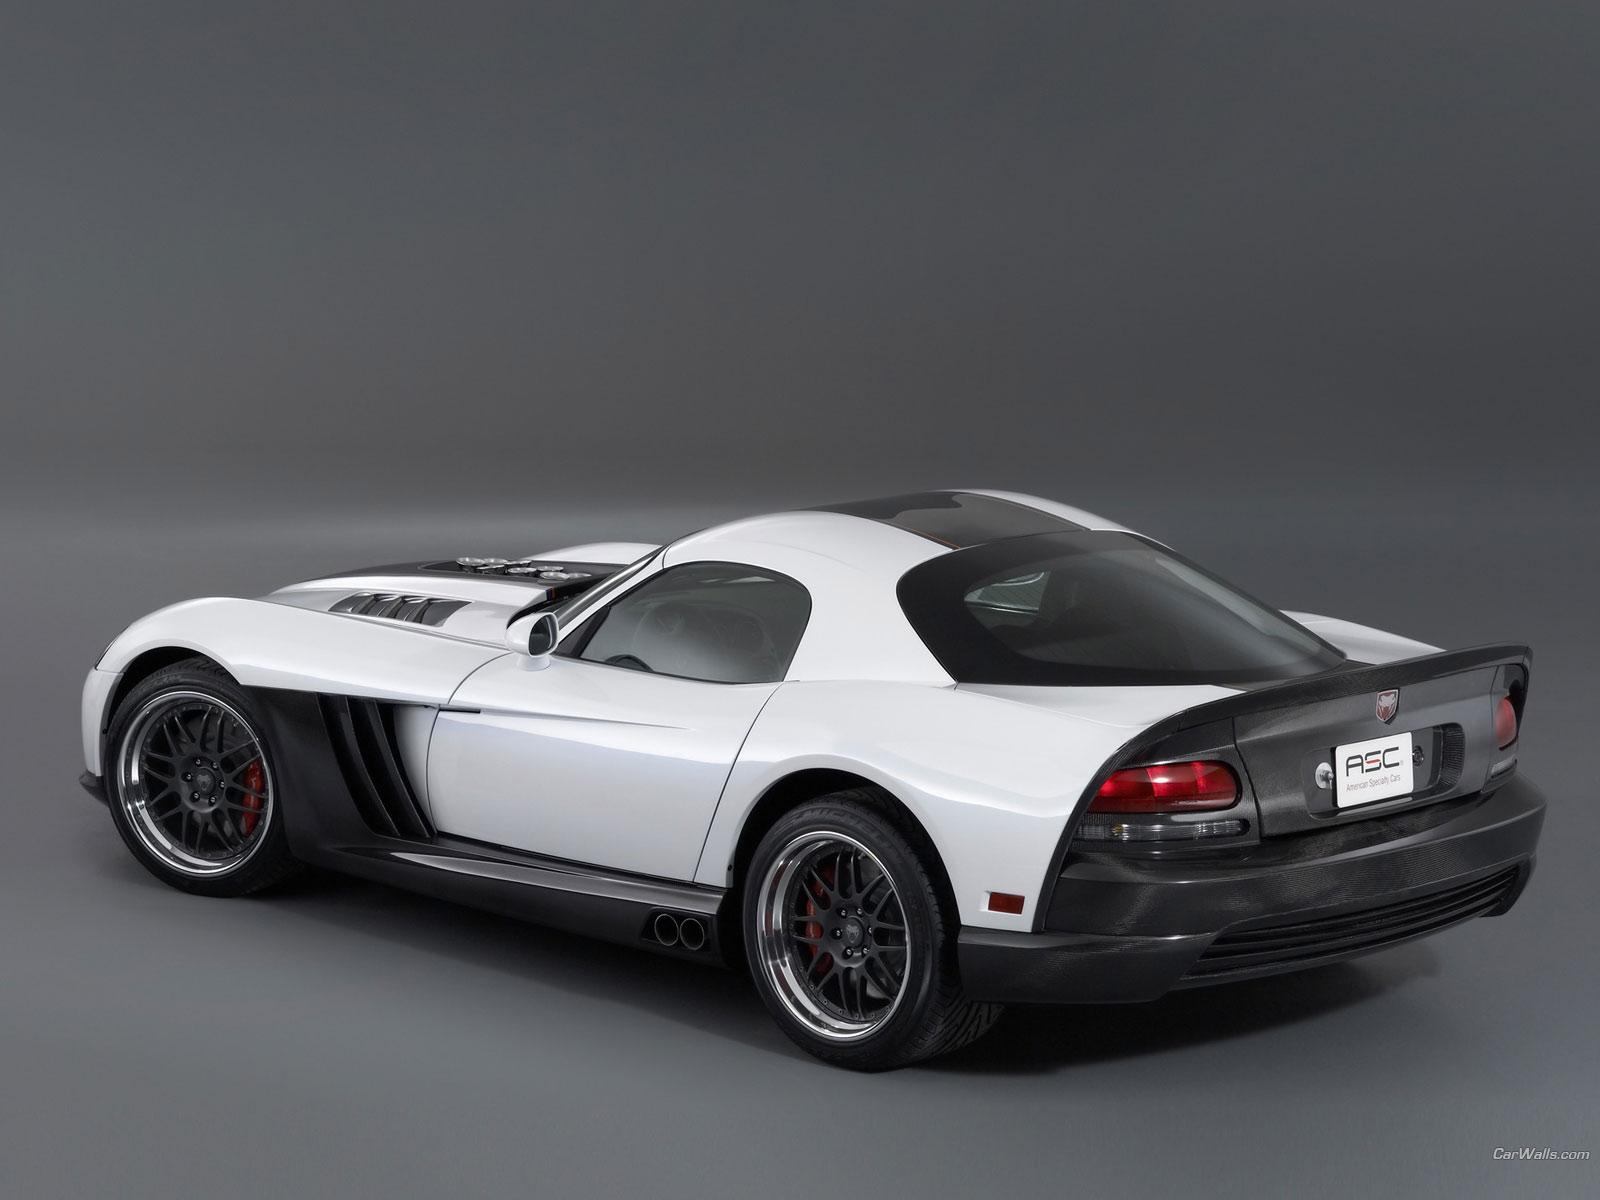 Dodge viper asc 1680x1050 1600 x 1200